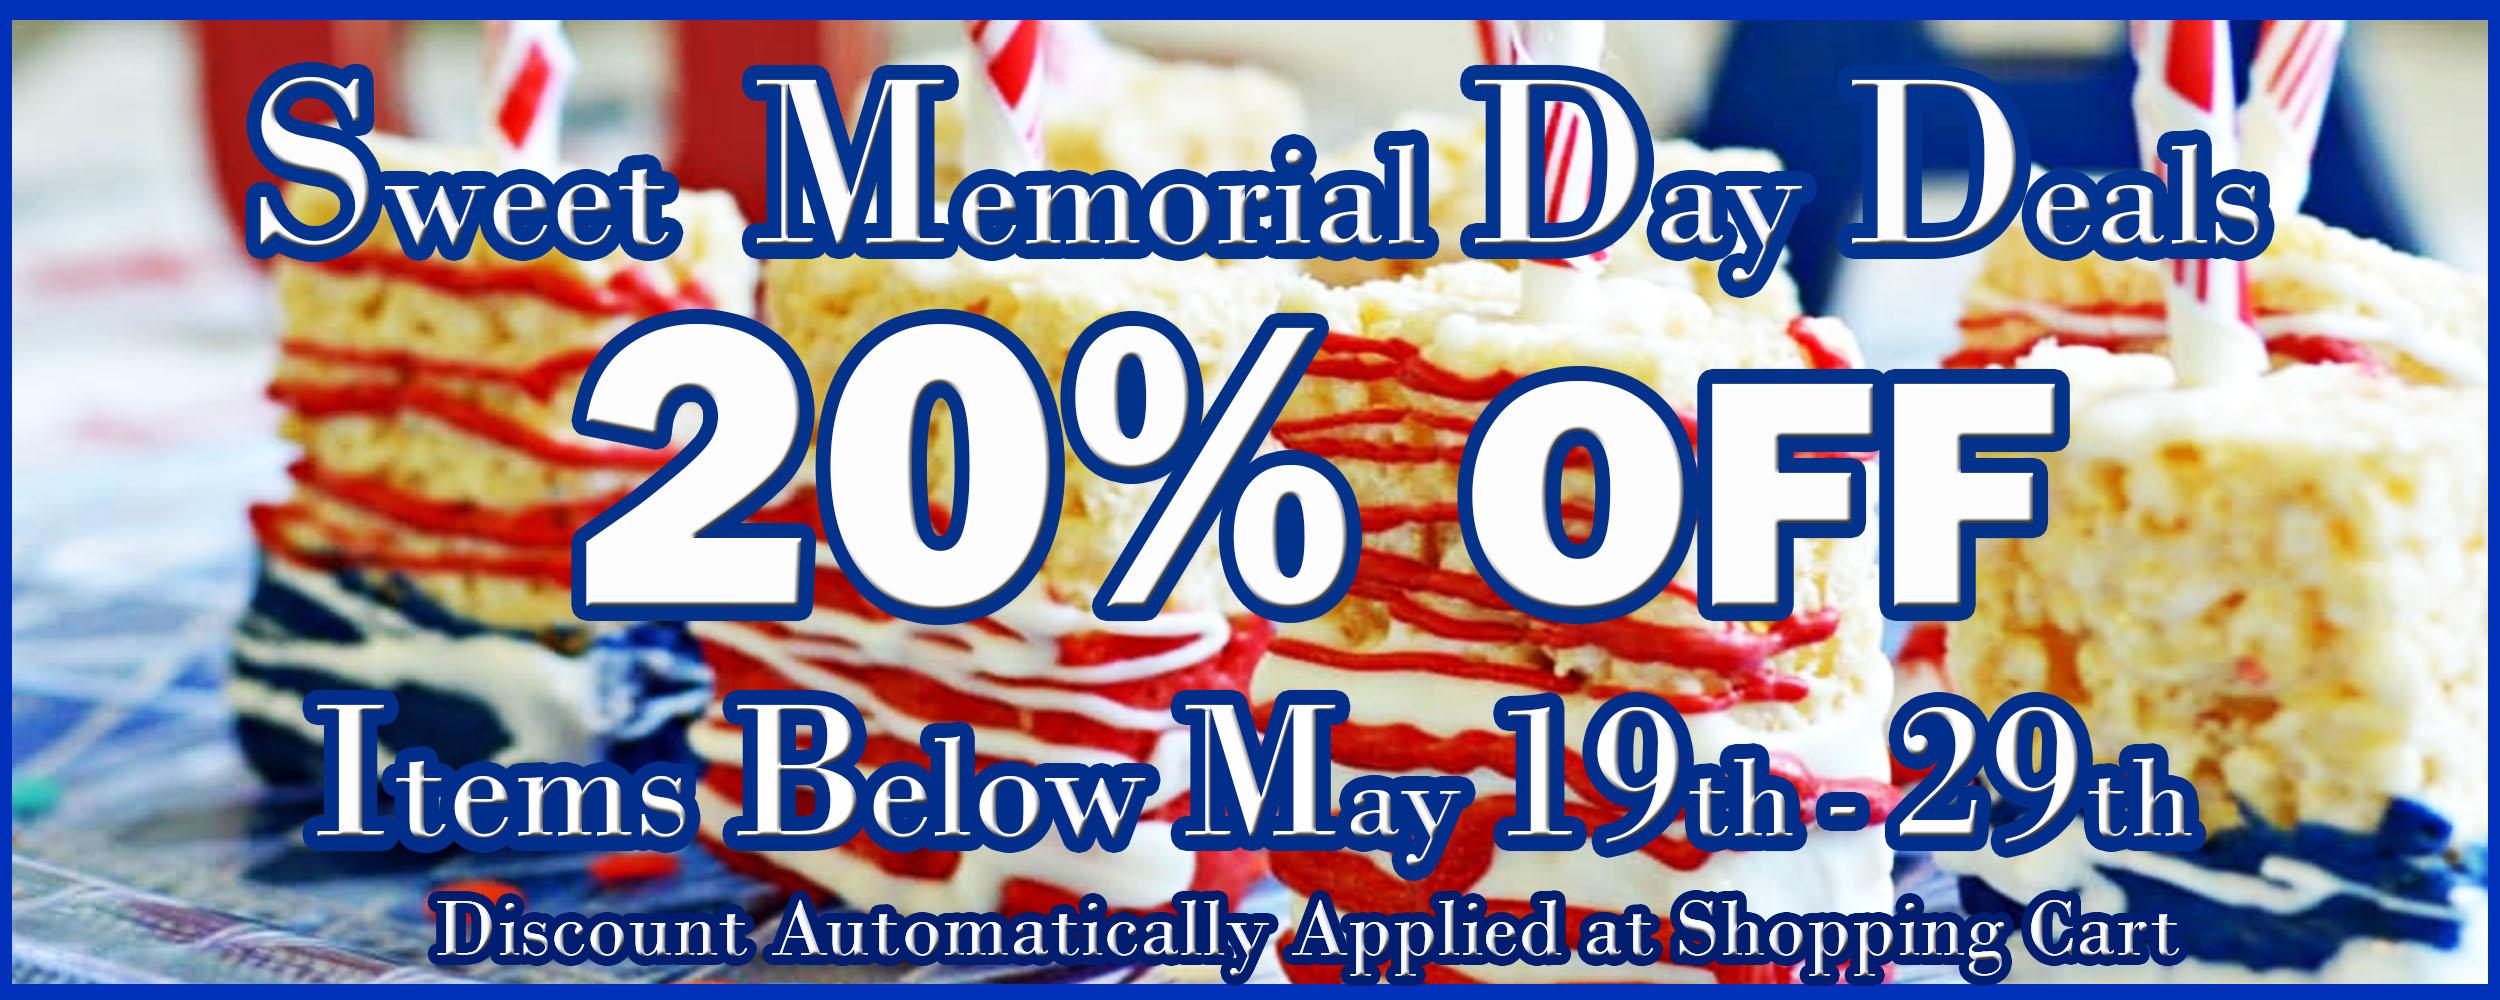 Memorial Day Sale: 20% OFF